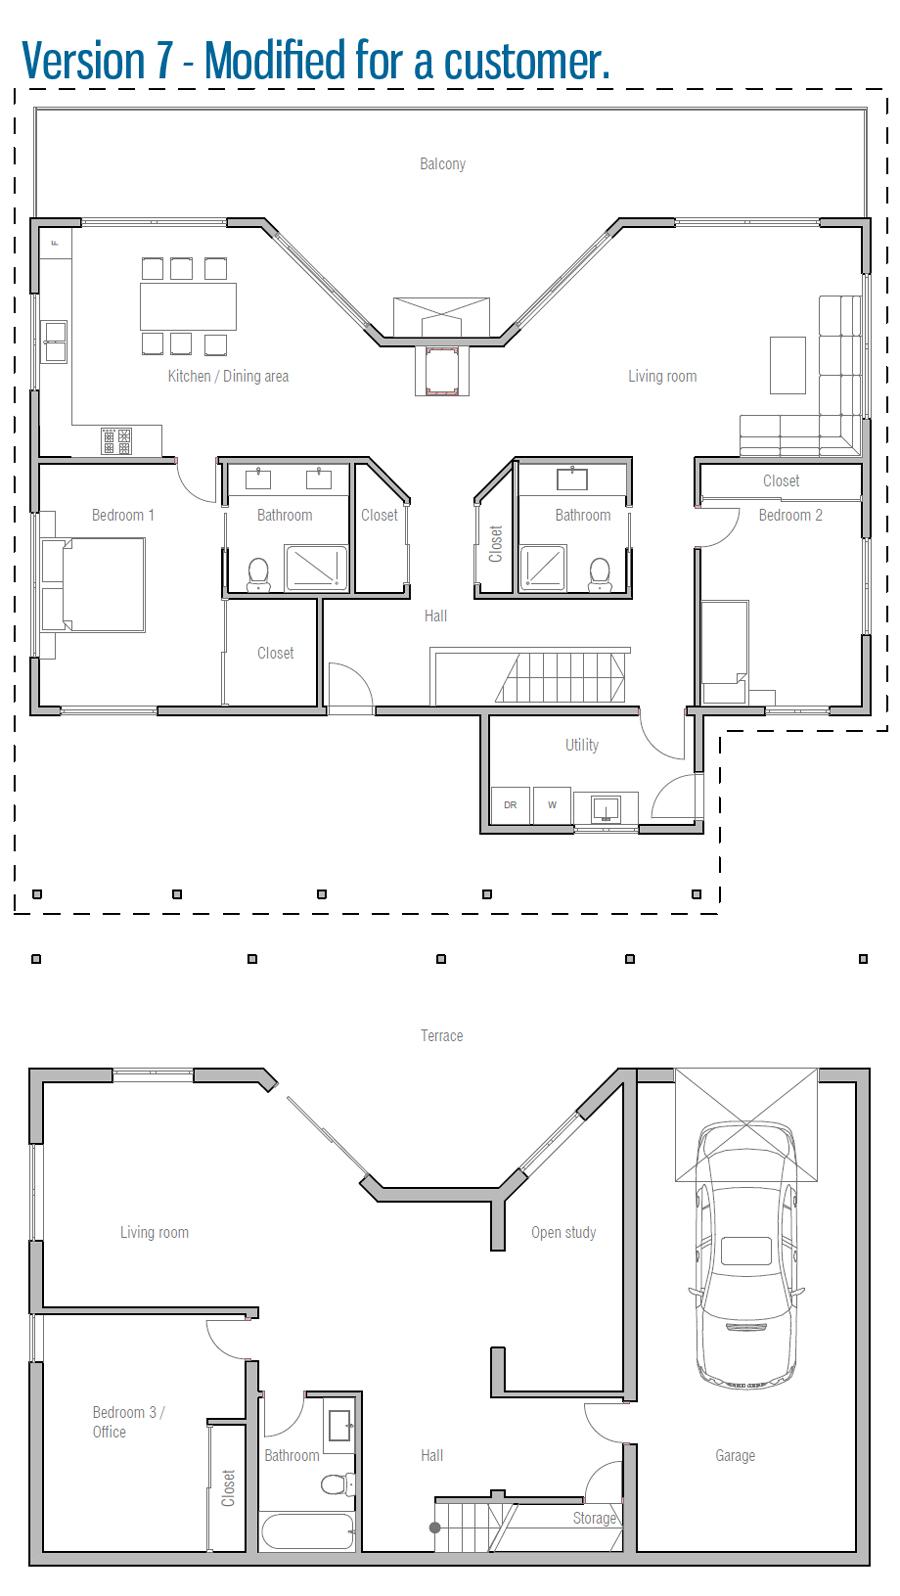 affordable-homes_30_HOUSE_PLAN_CH61_V7.jpg